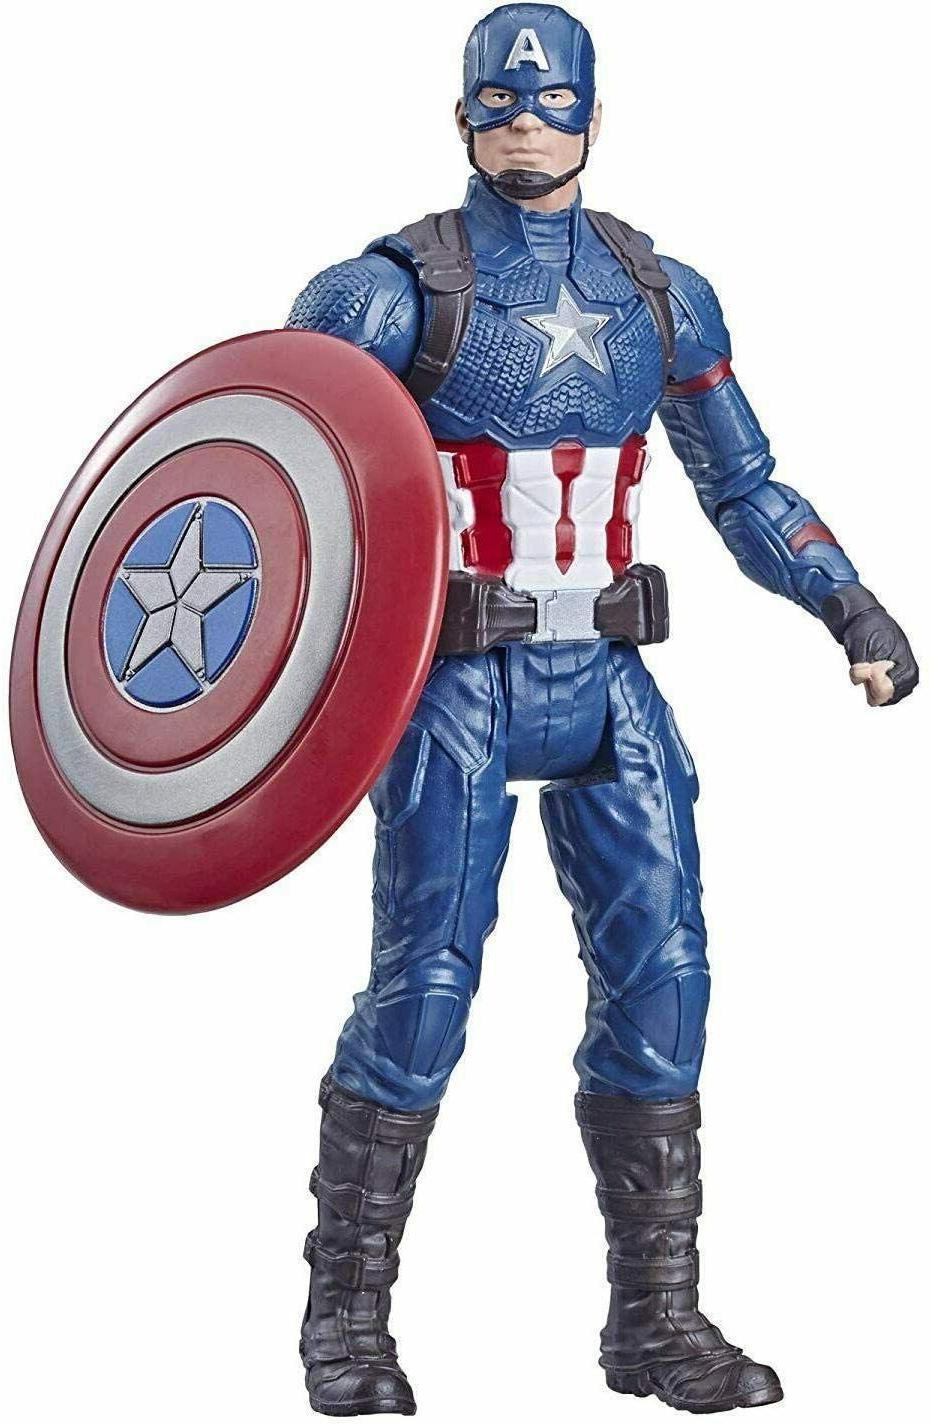 Avengers Captain America Action